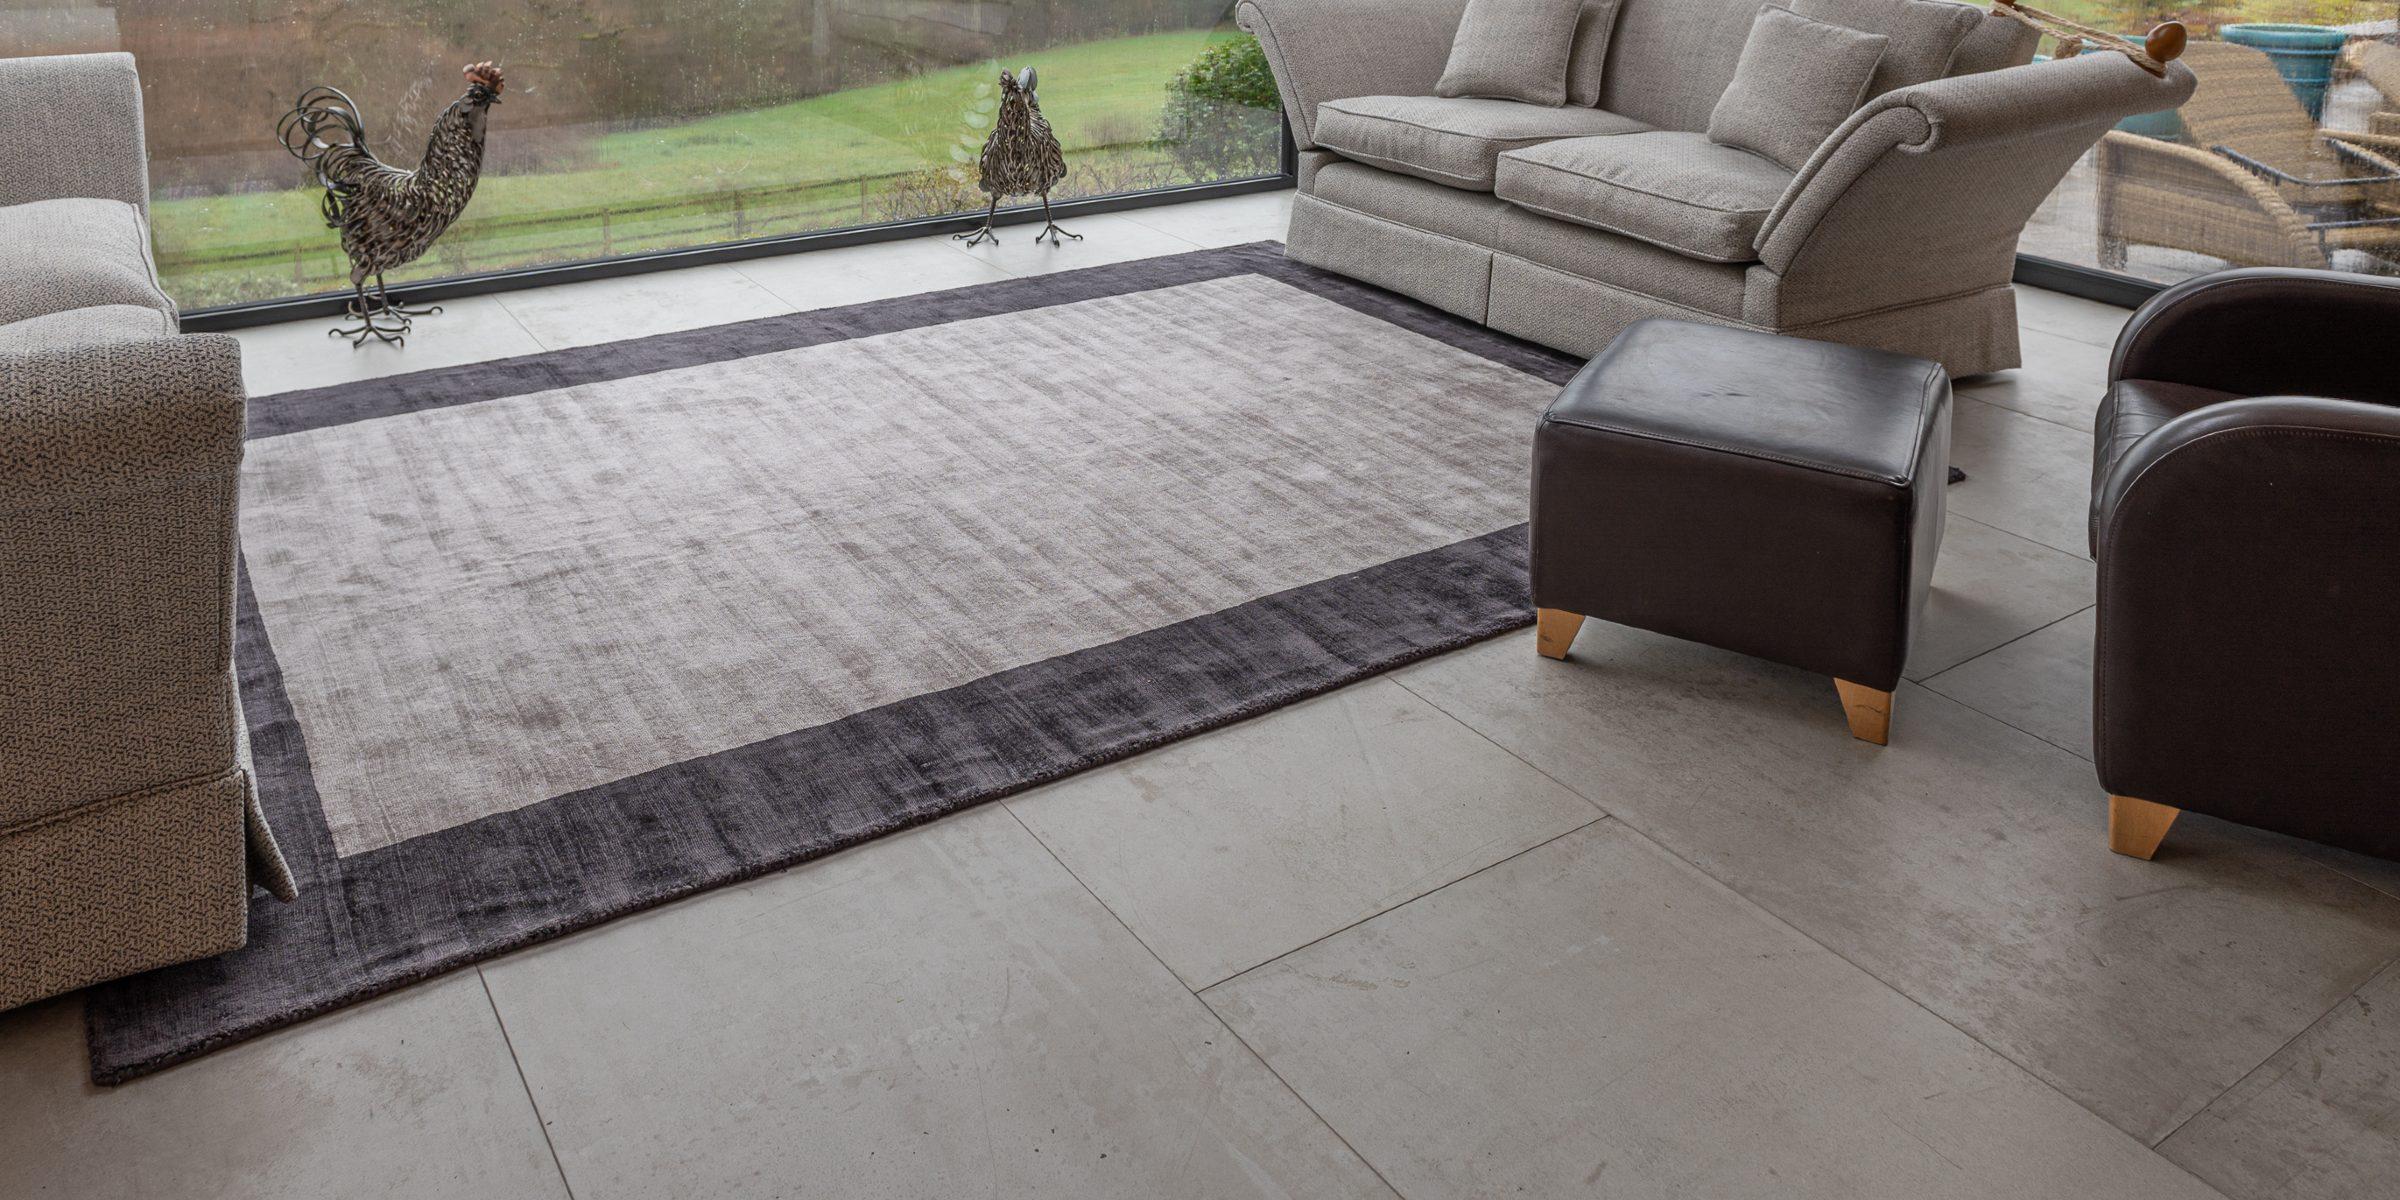 concreate natural grey floors in cranleigh home